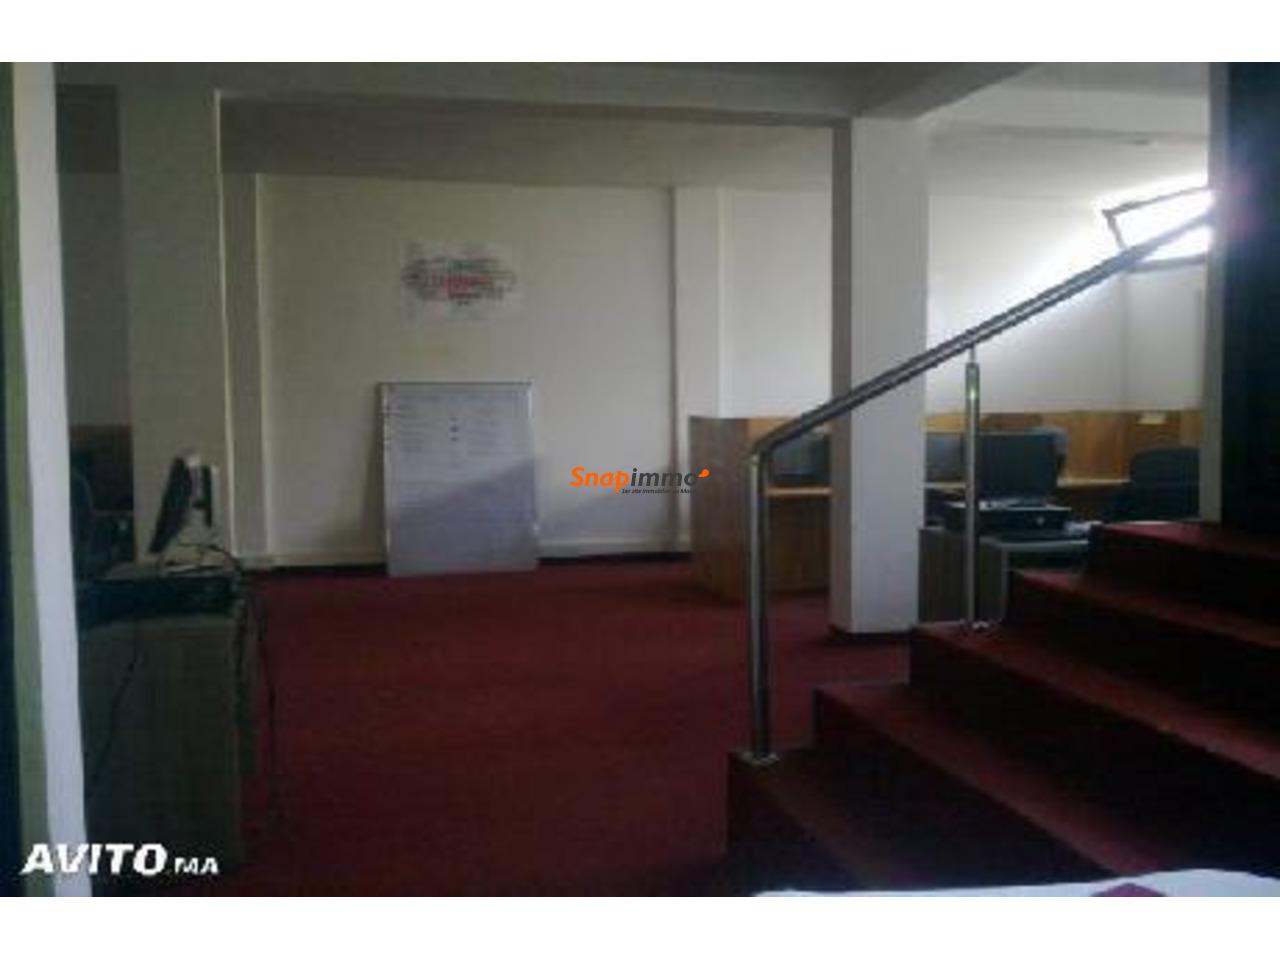 Location appartement usage bureaux zone commerce a sale al jadida